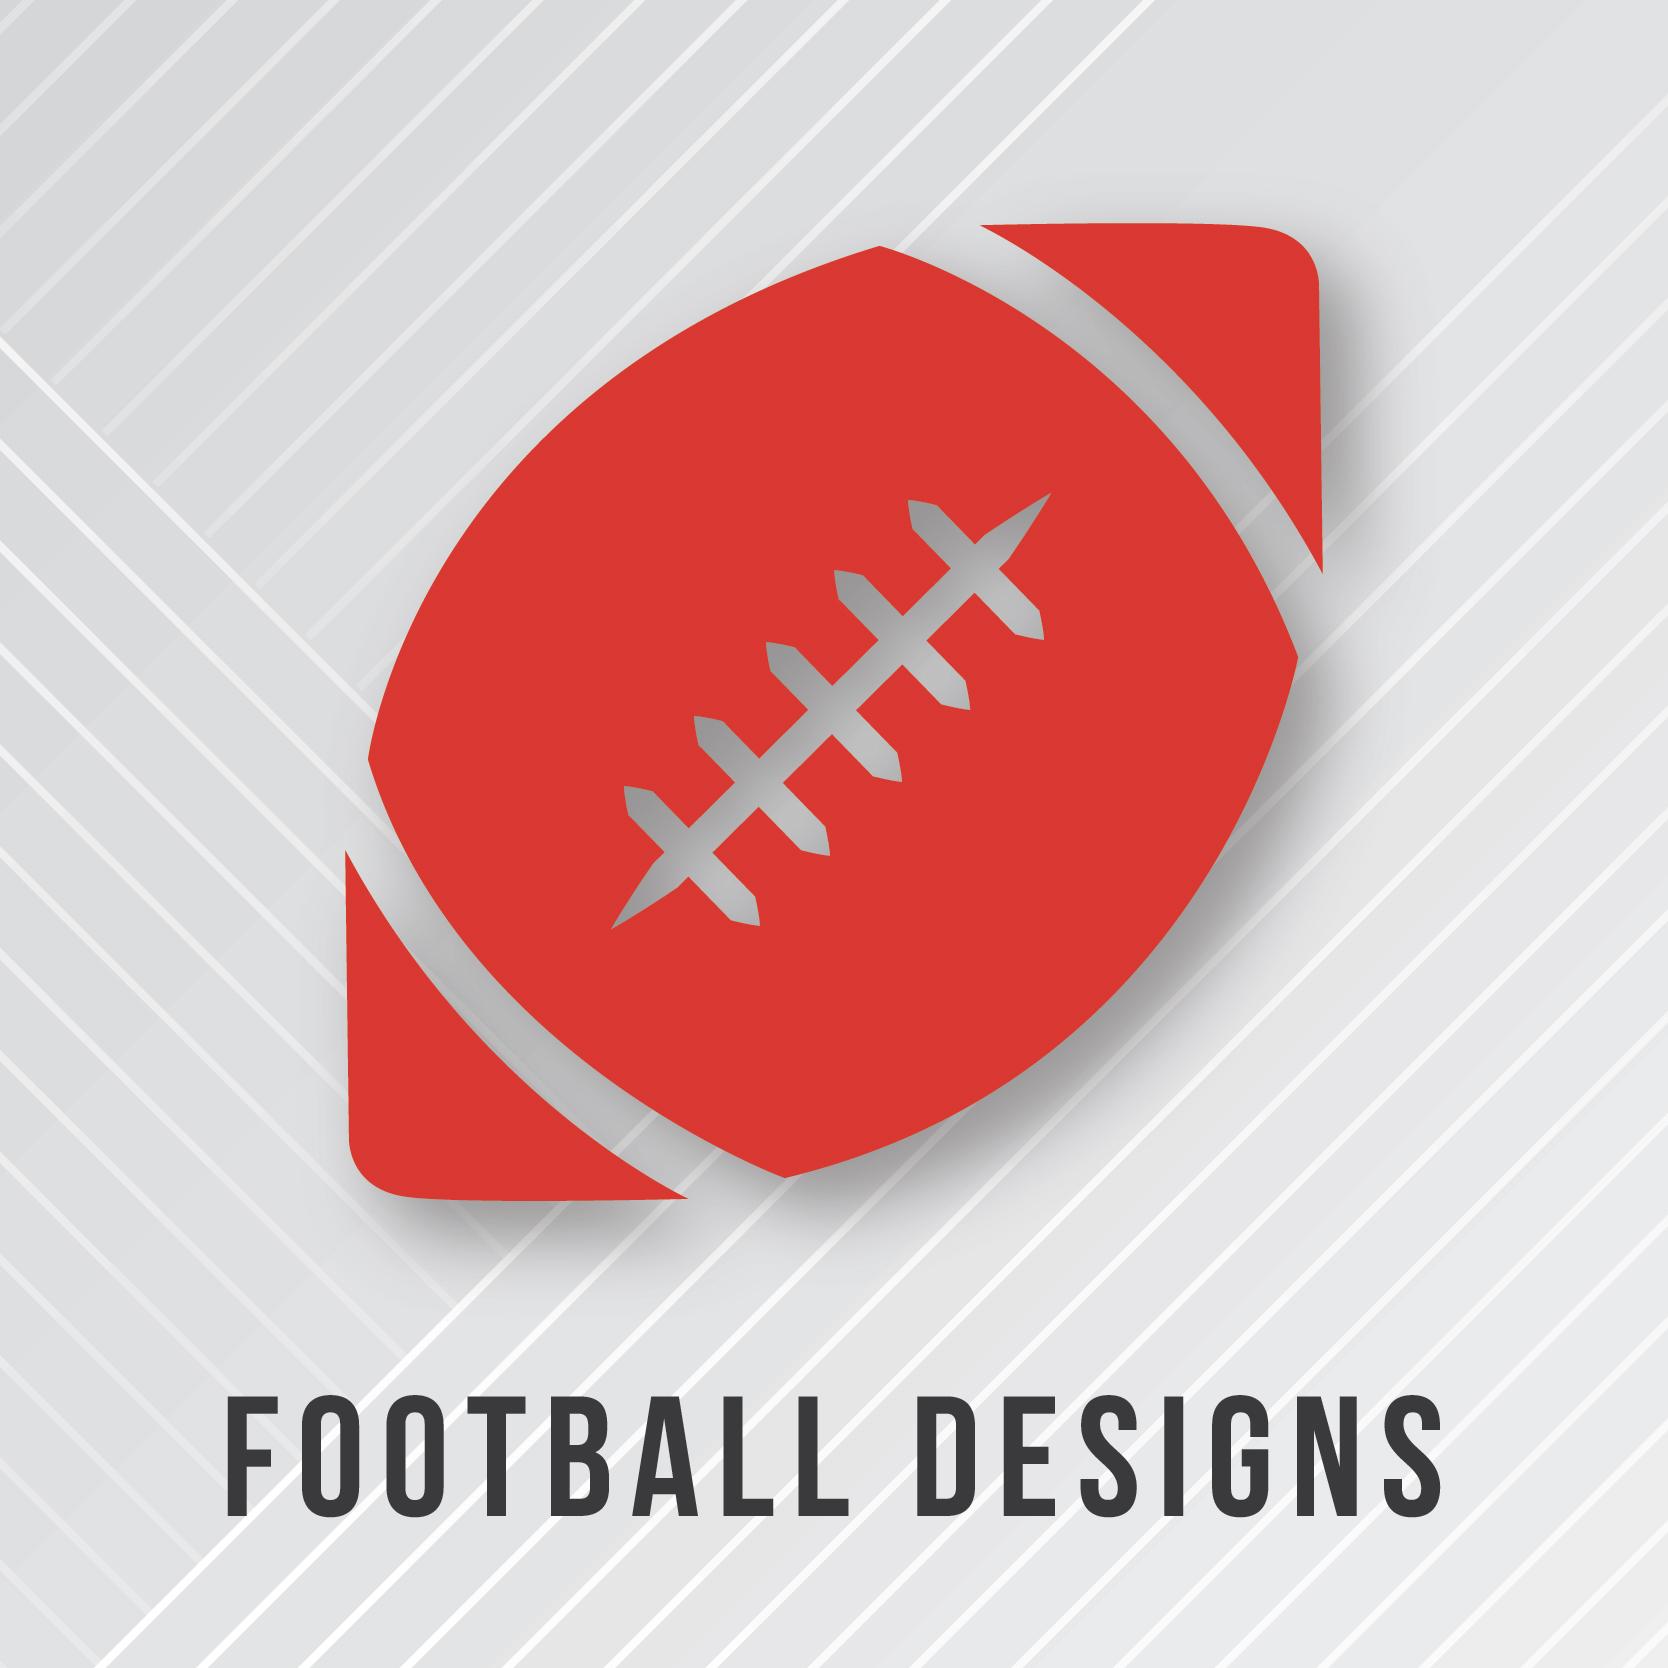 Football Design Icon